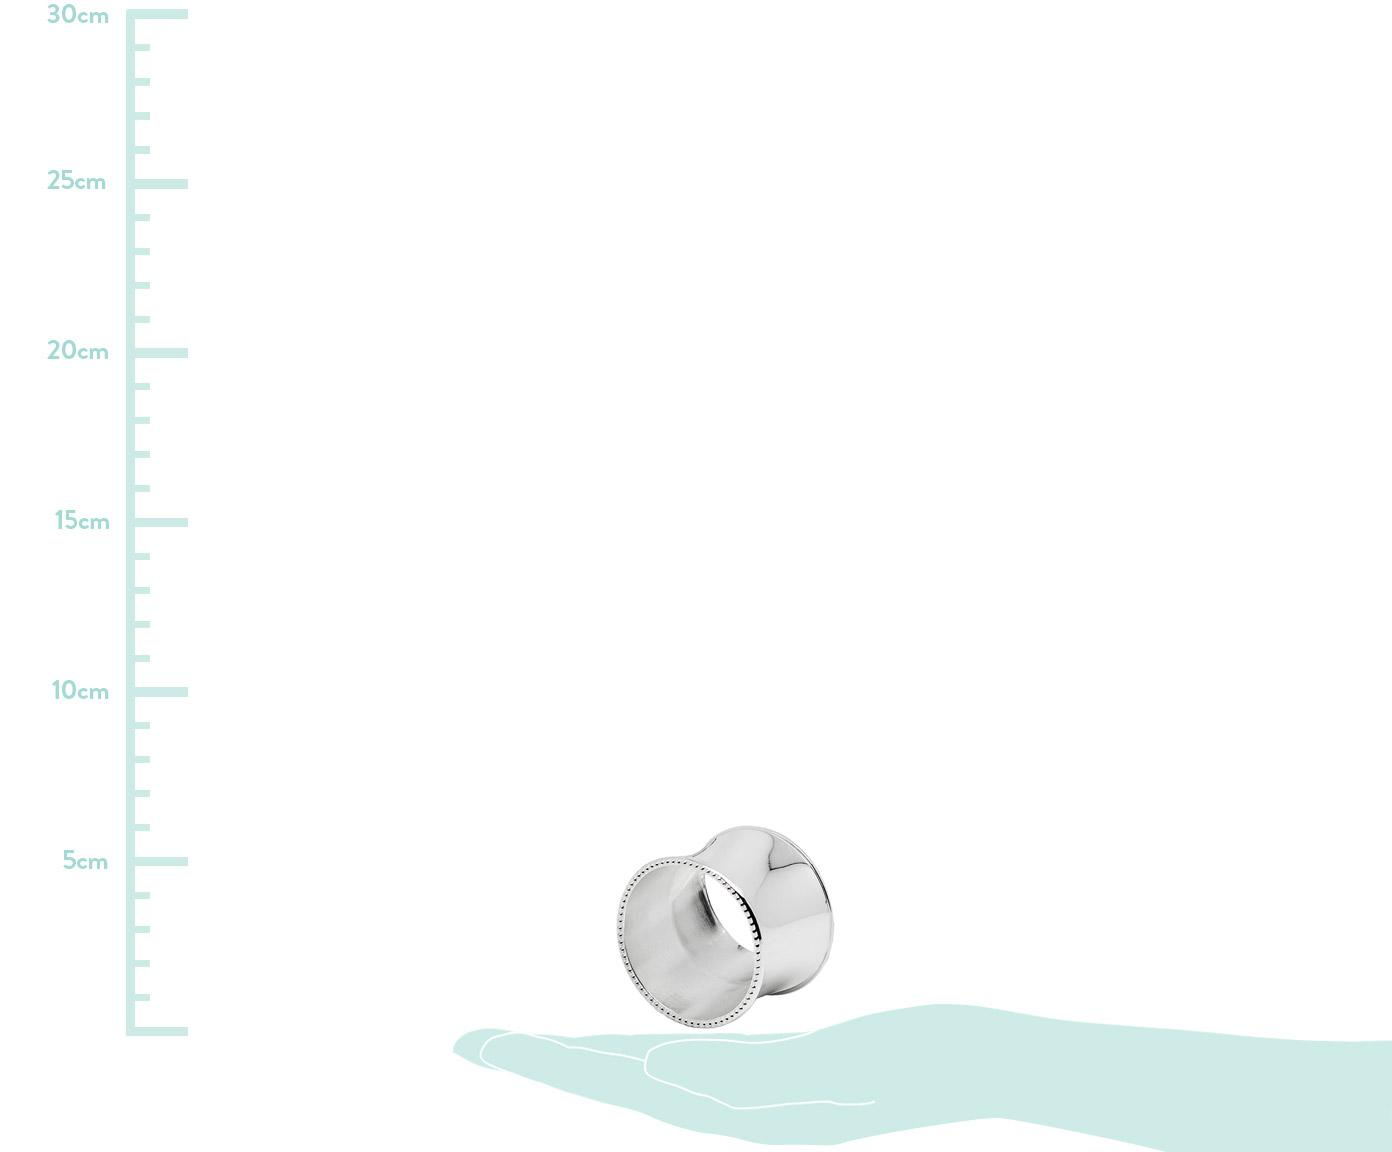 Serviettenringe Perla, 4 Stück, Stahl, versilbert und anlaufgeschützt, Silber, Ø 5 x H 4 cm